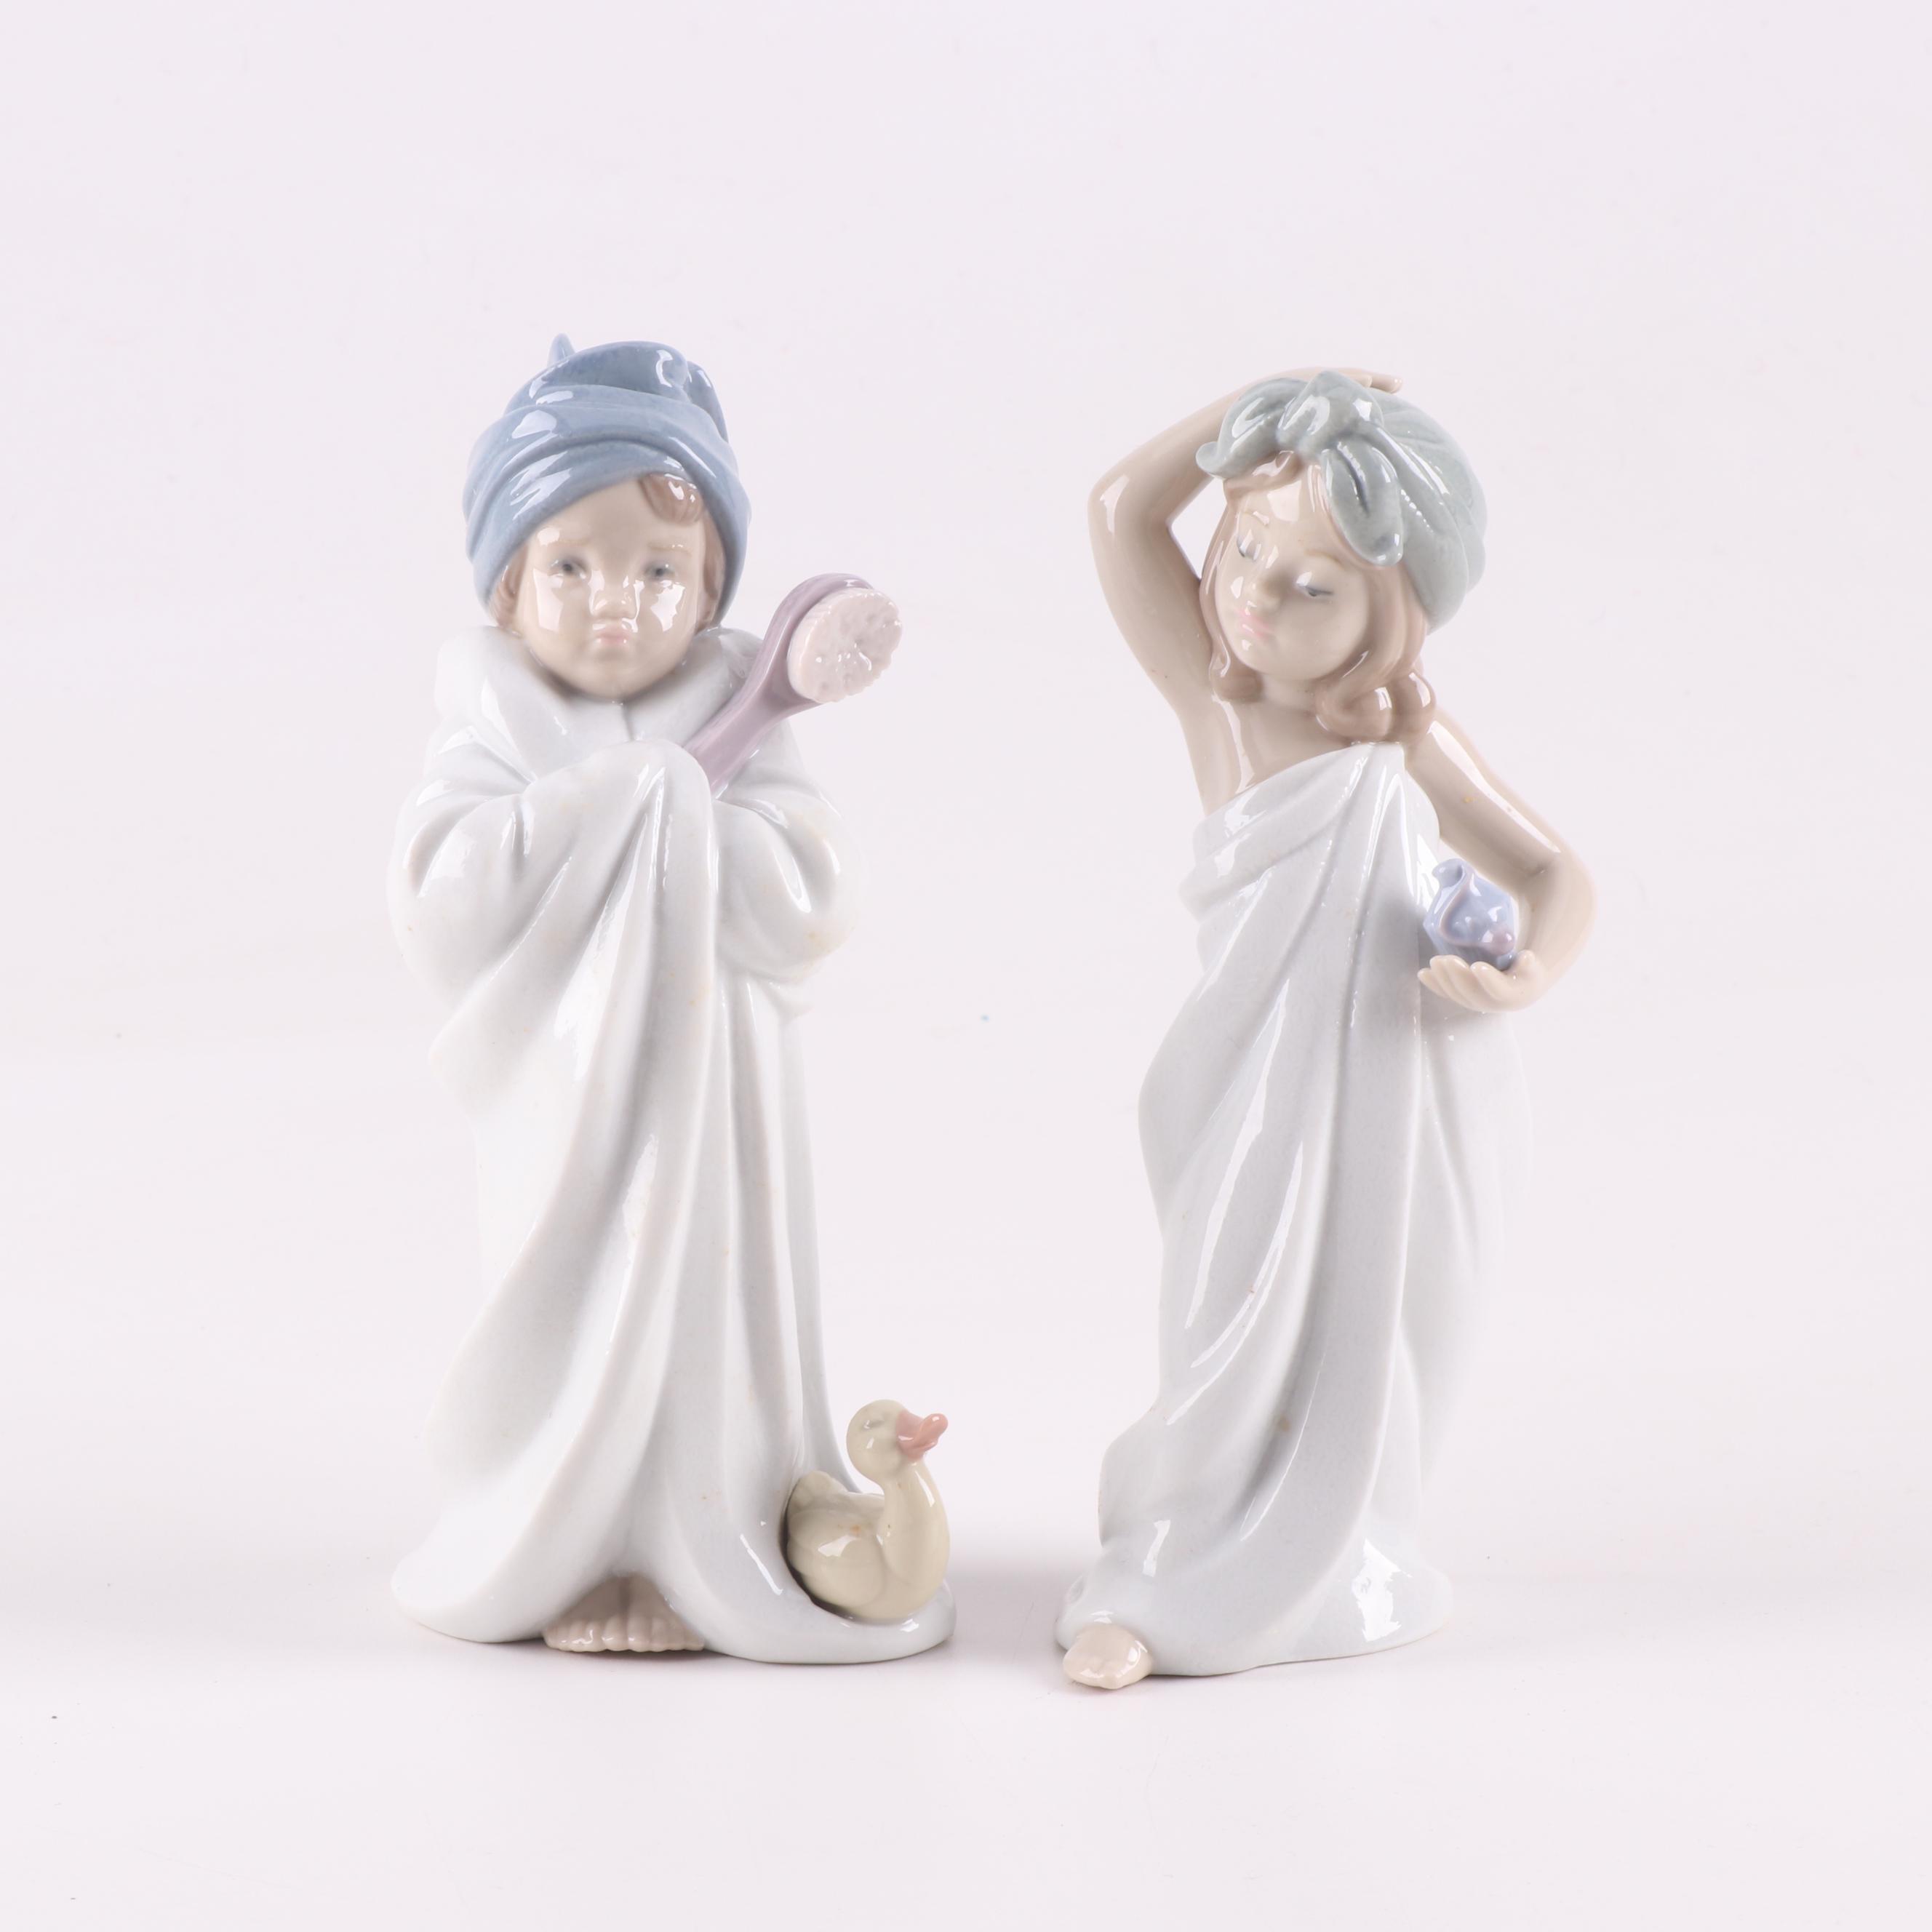 Lladr/ó Bundled Bather Figurine